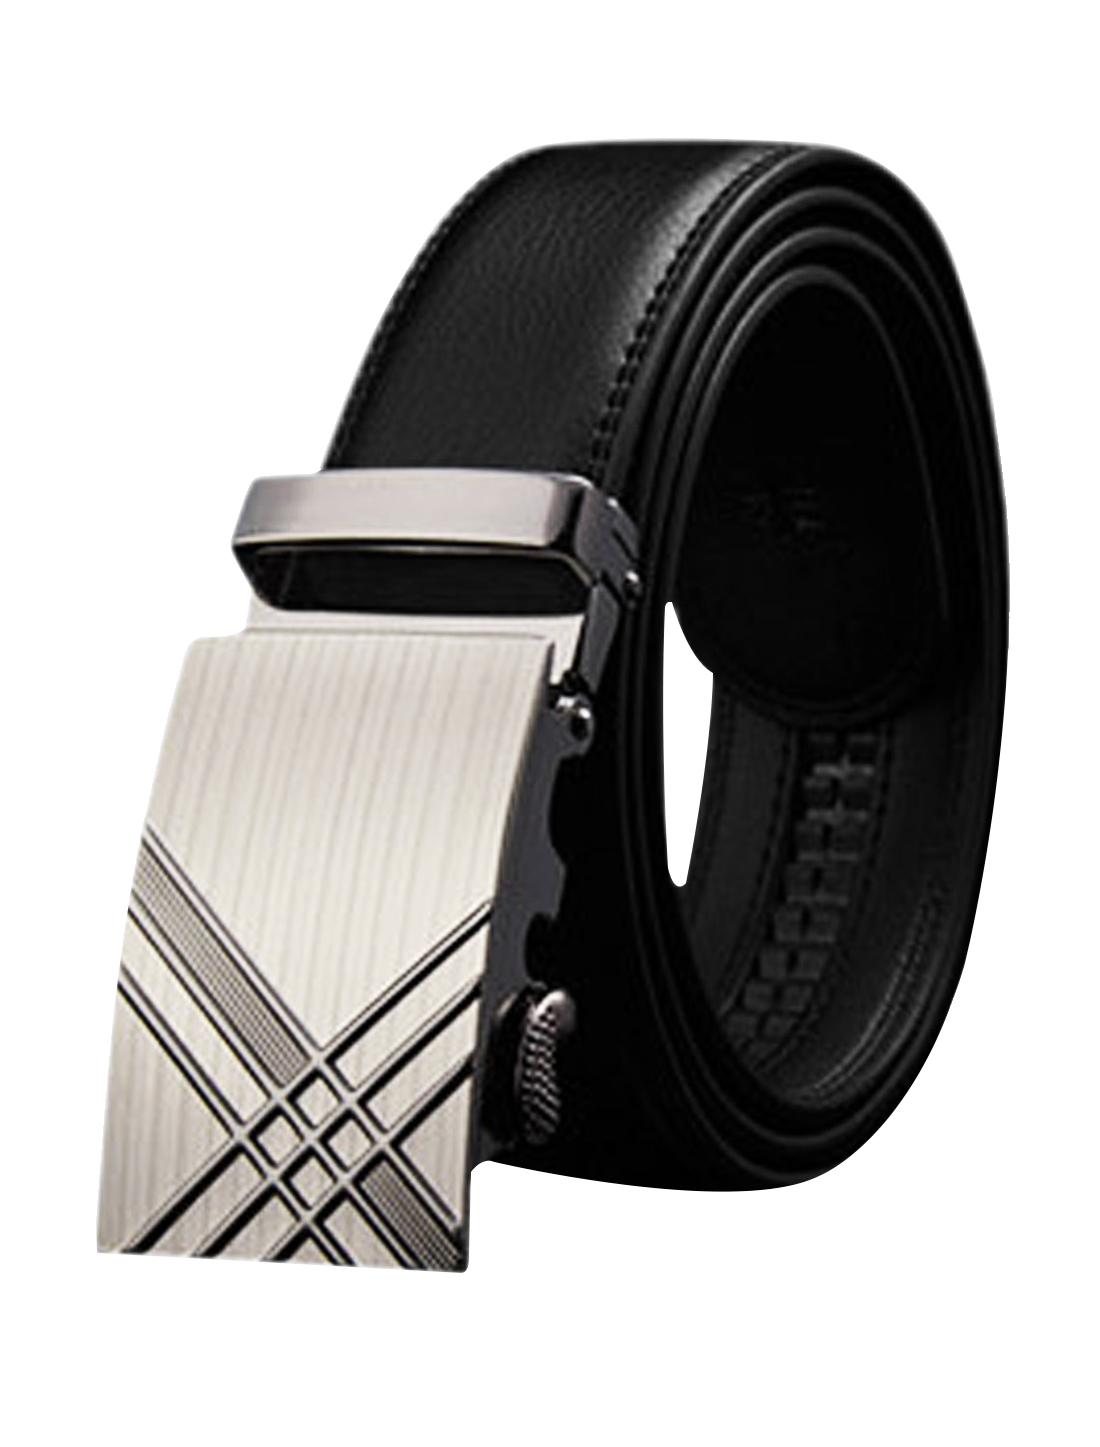 Men Automatic Buckle Holeless Stitched PU Ratchet Belt Black 115CM